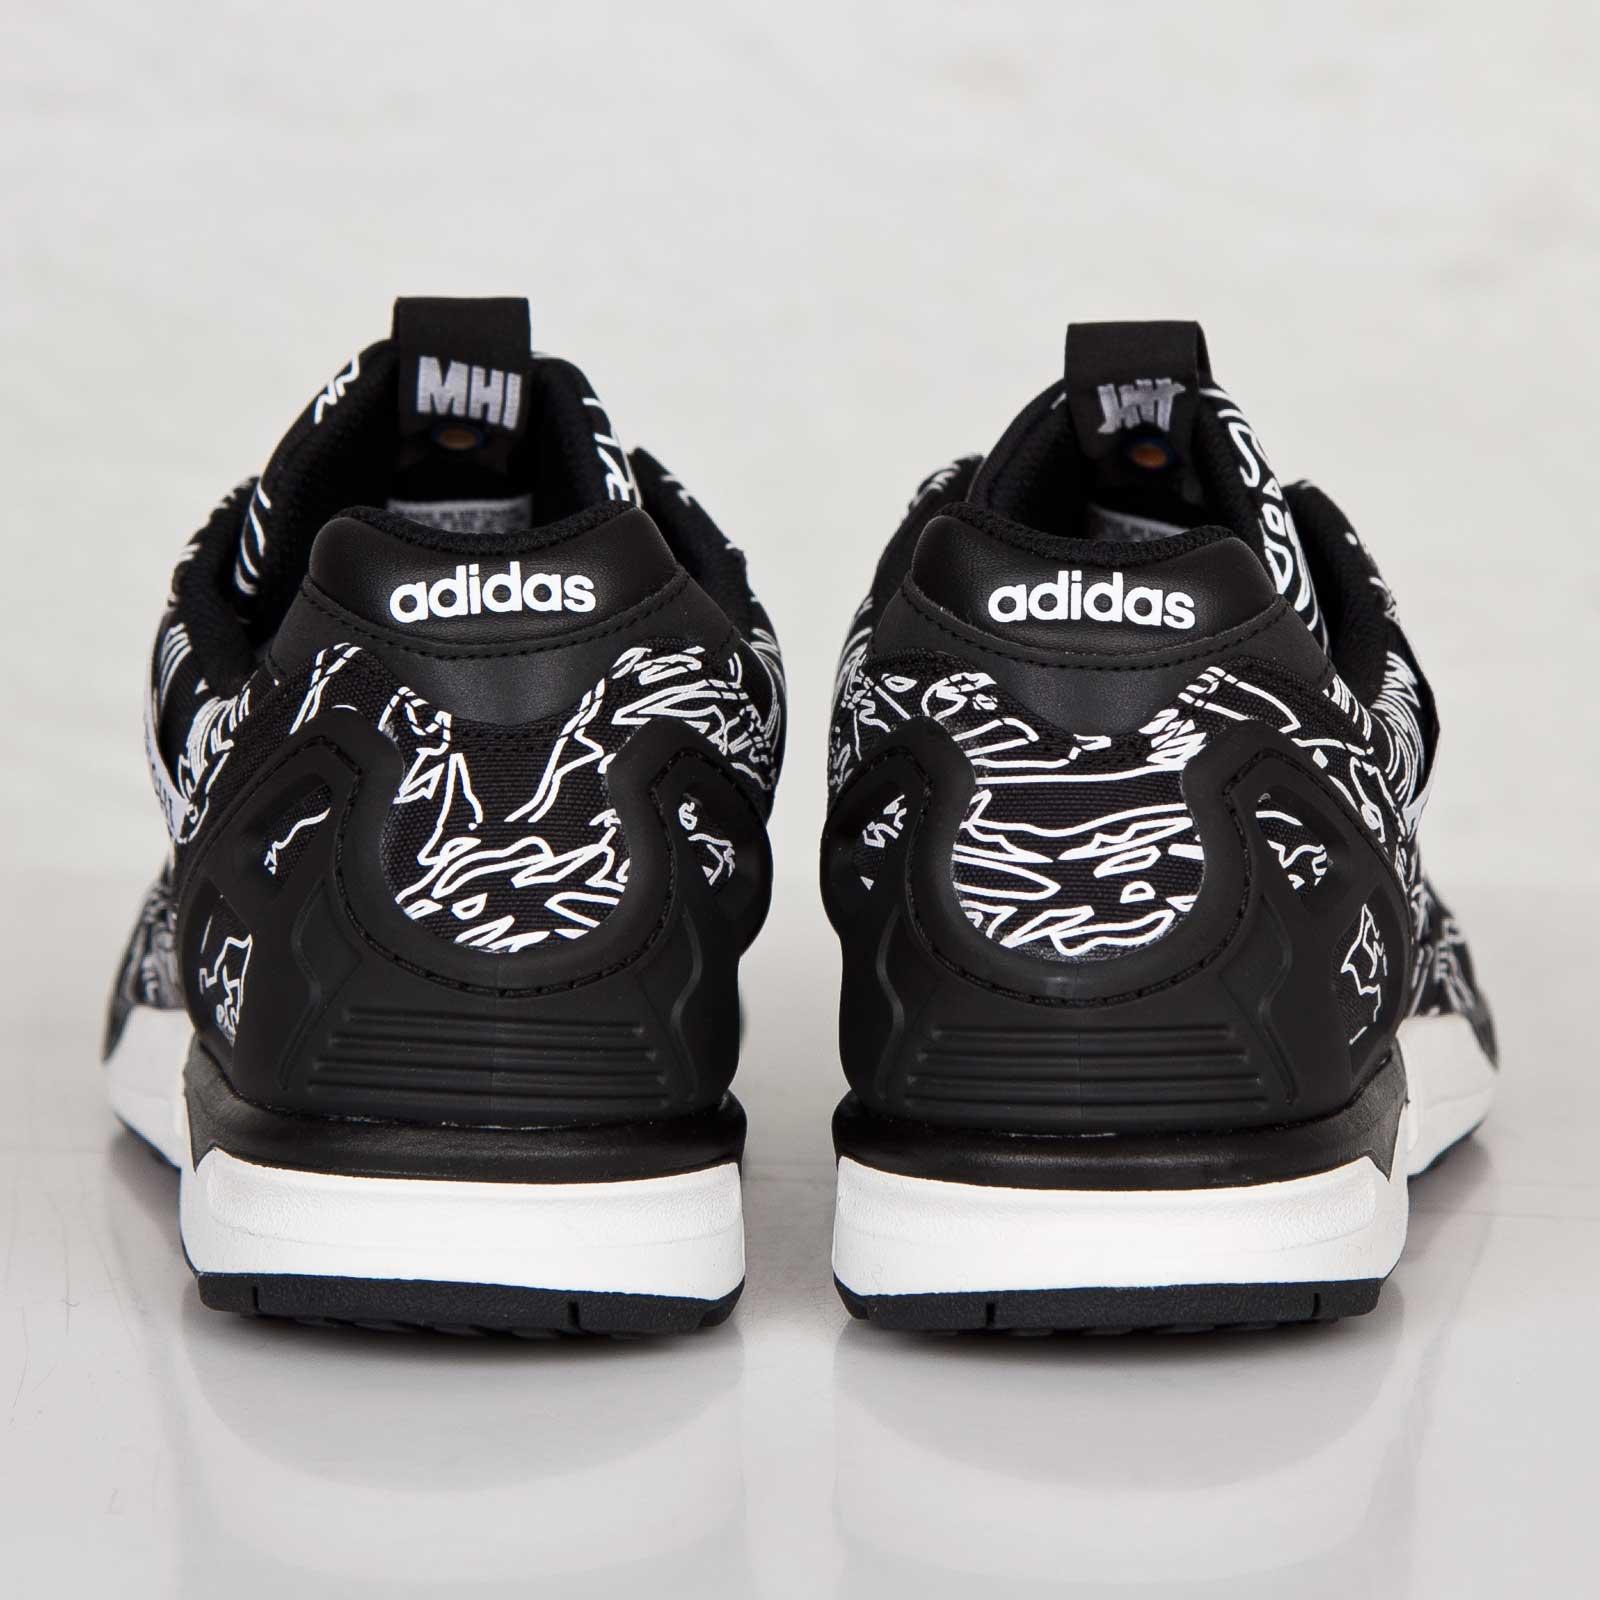 bd7138ed3 adidas ZX 5000 - UNDFTD x Maharishi - B33981 - Sneakersnstuff ...